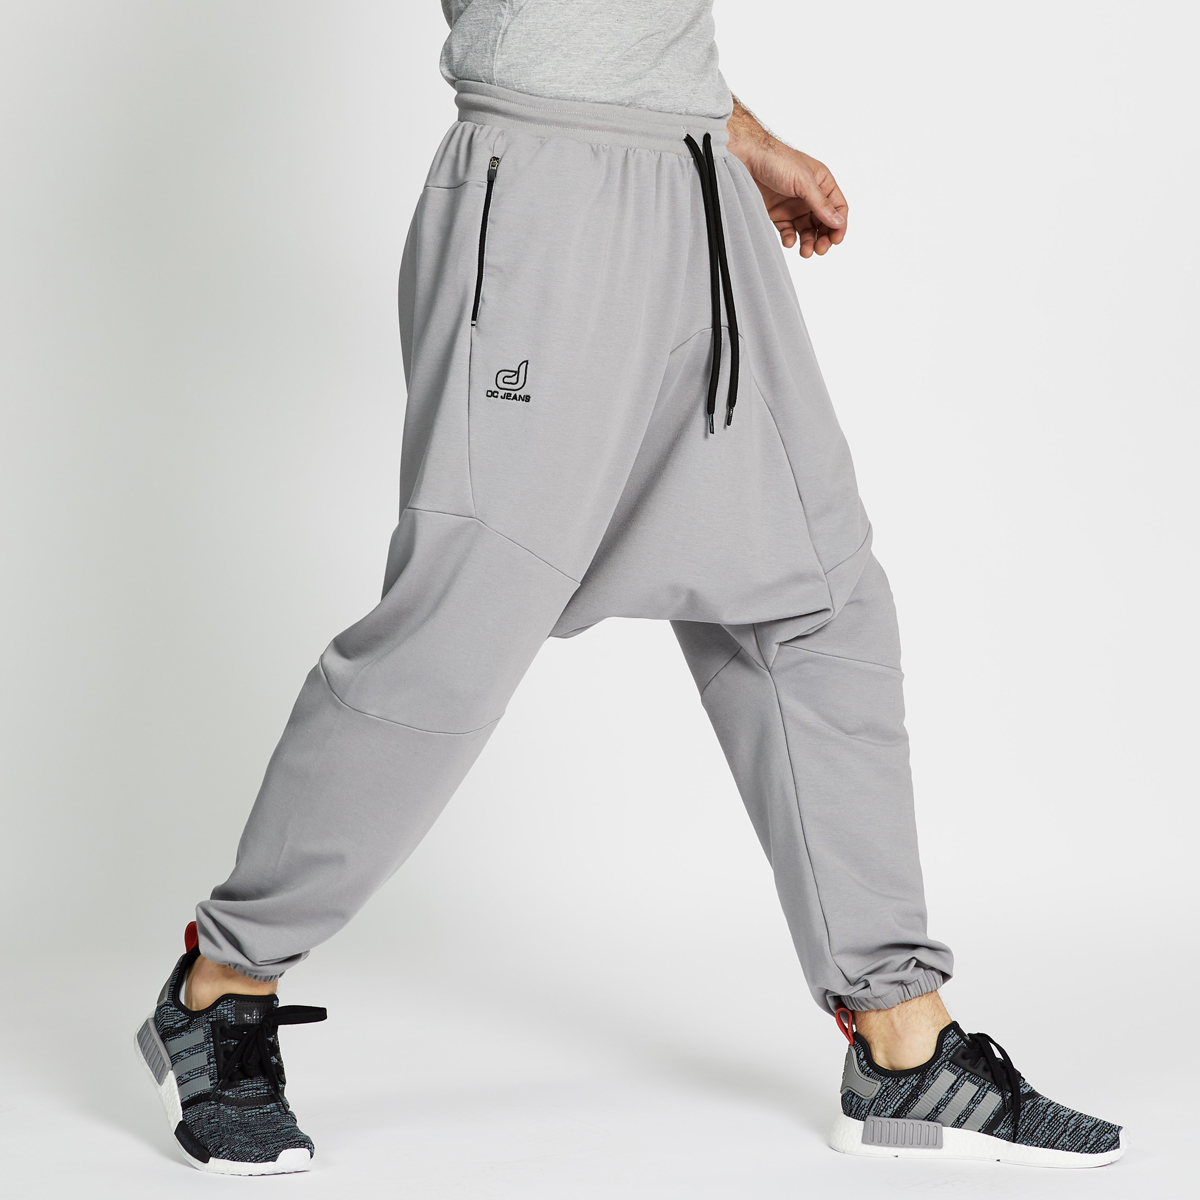 Saroual Jogging GRIS Uni evo long S18 - DCJeans ® - sarouel ... ff042439501